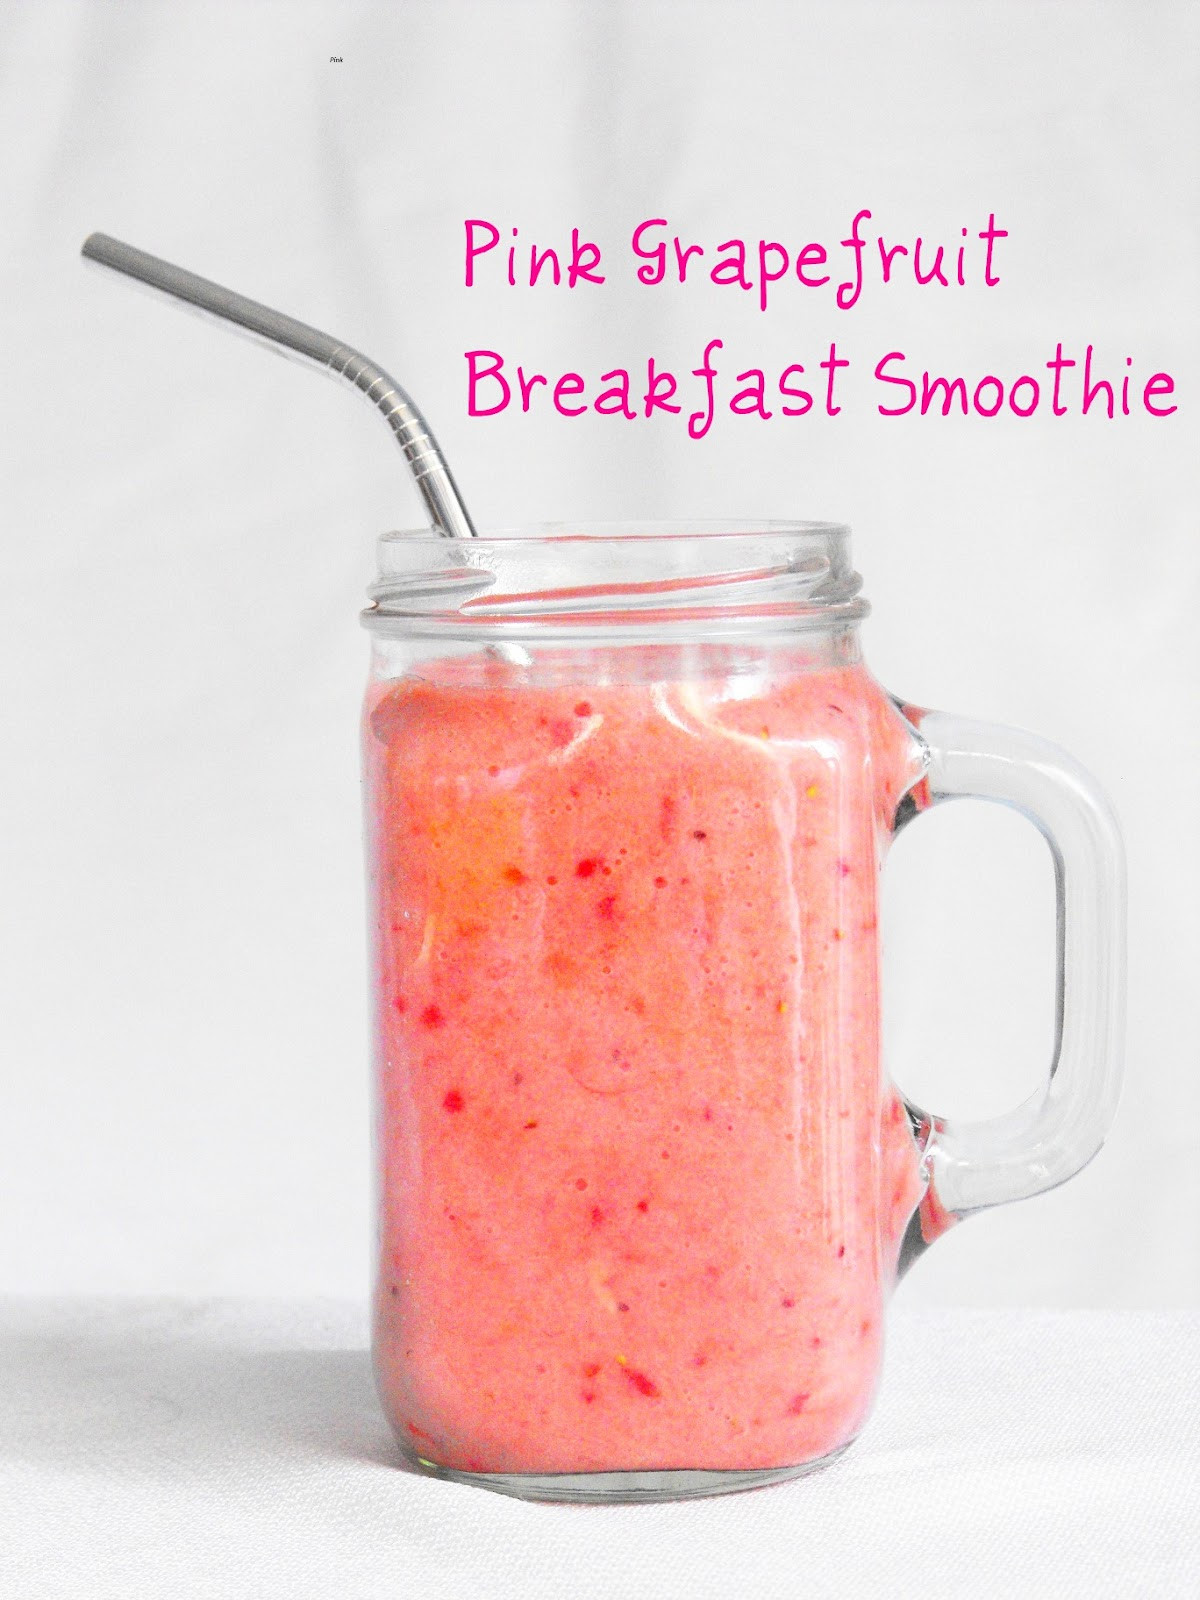 Breakfast Smoothie Recipes  Pink Grapefruit Smoothie Sweet and Tart Breakfast Smoothie